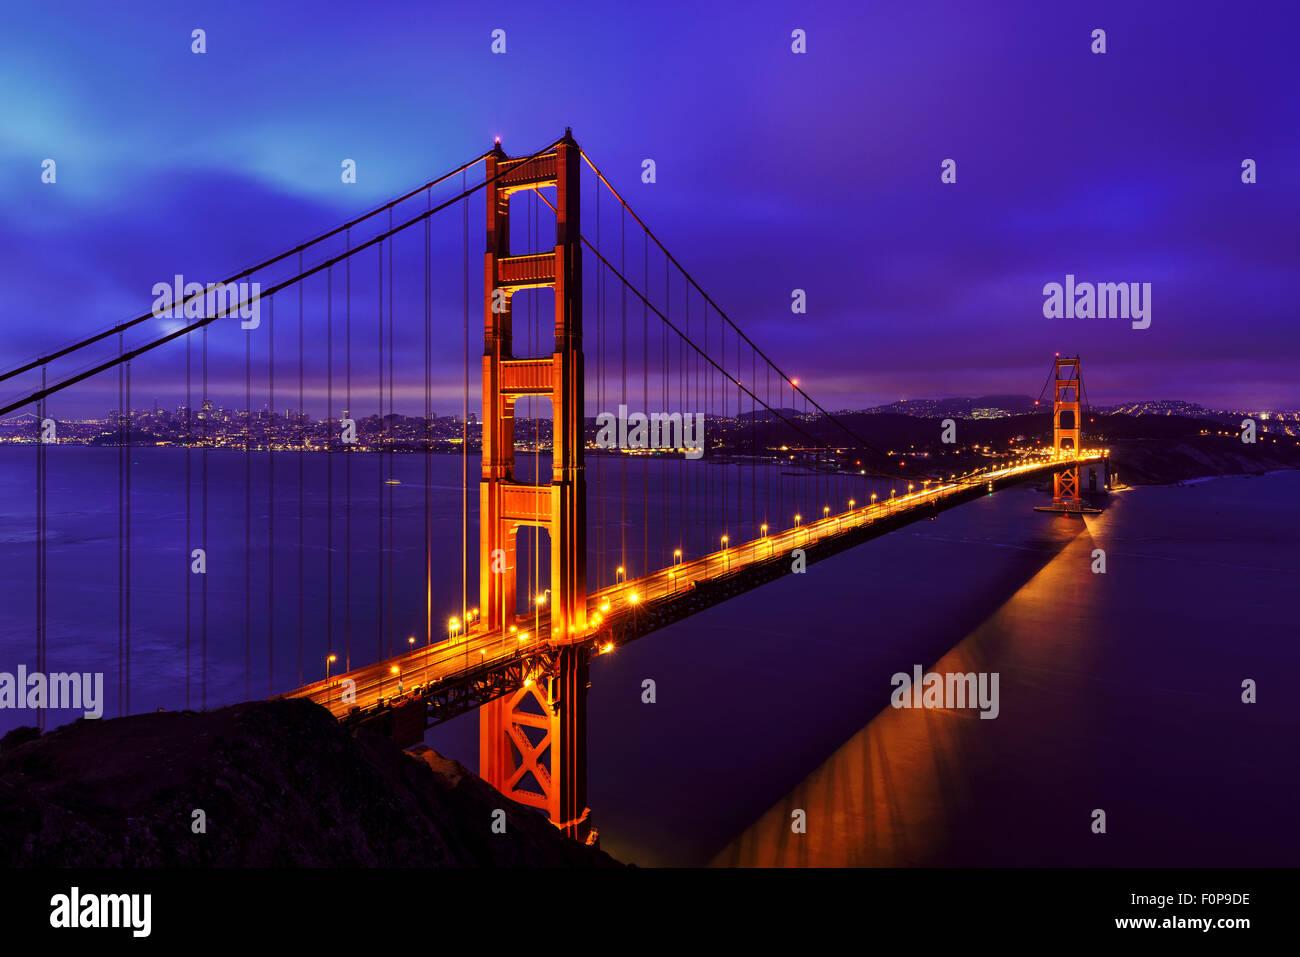 Blue night at Golden Gate Bridge, San Francisco - Stock Image